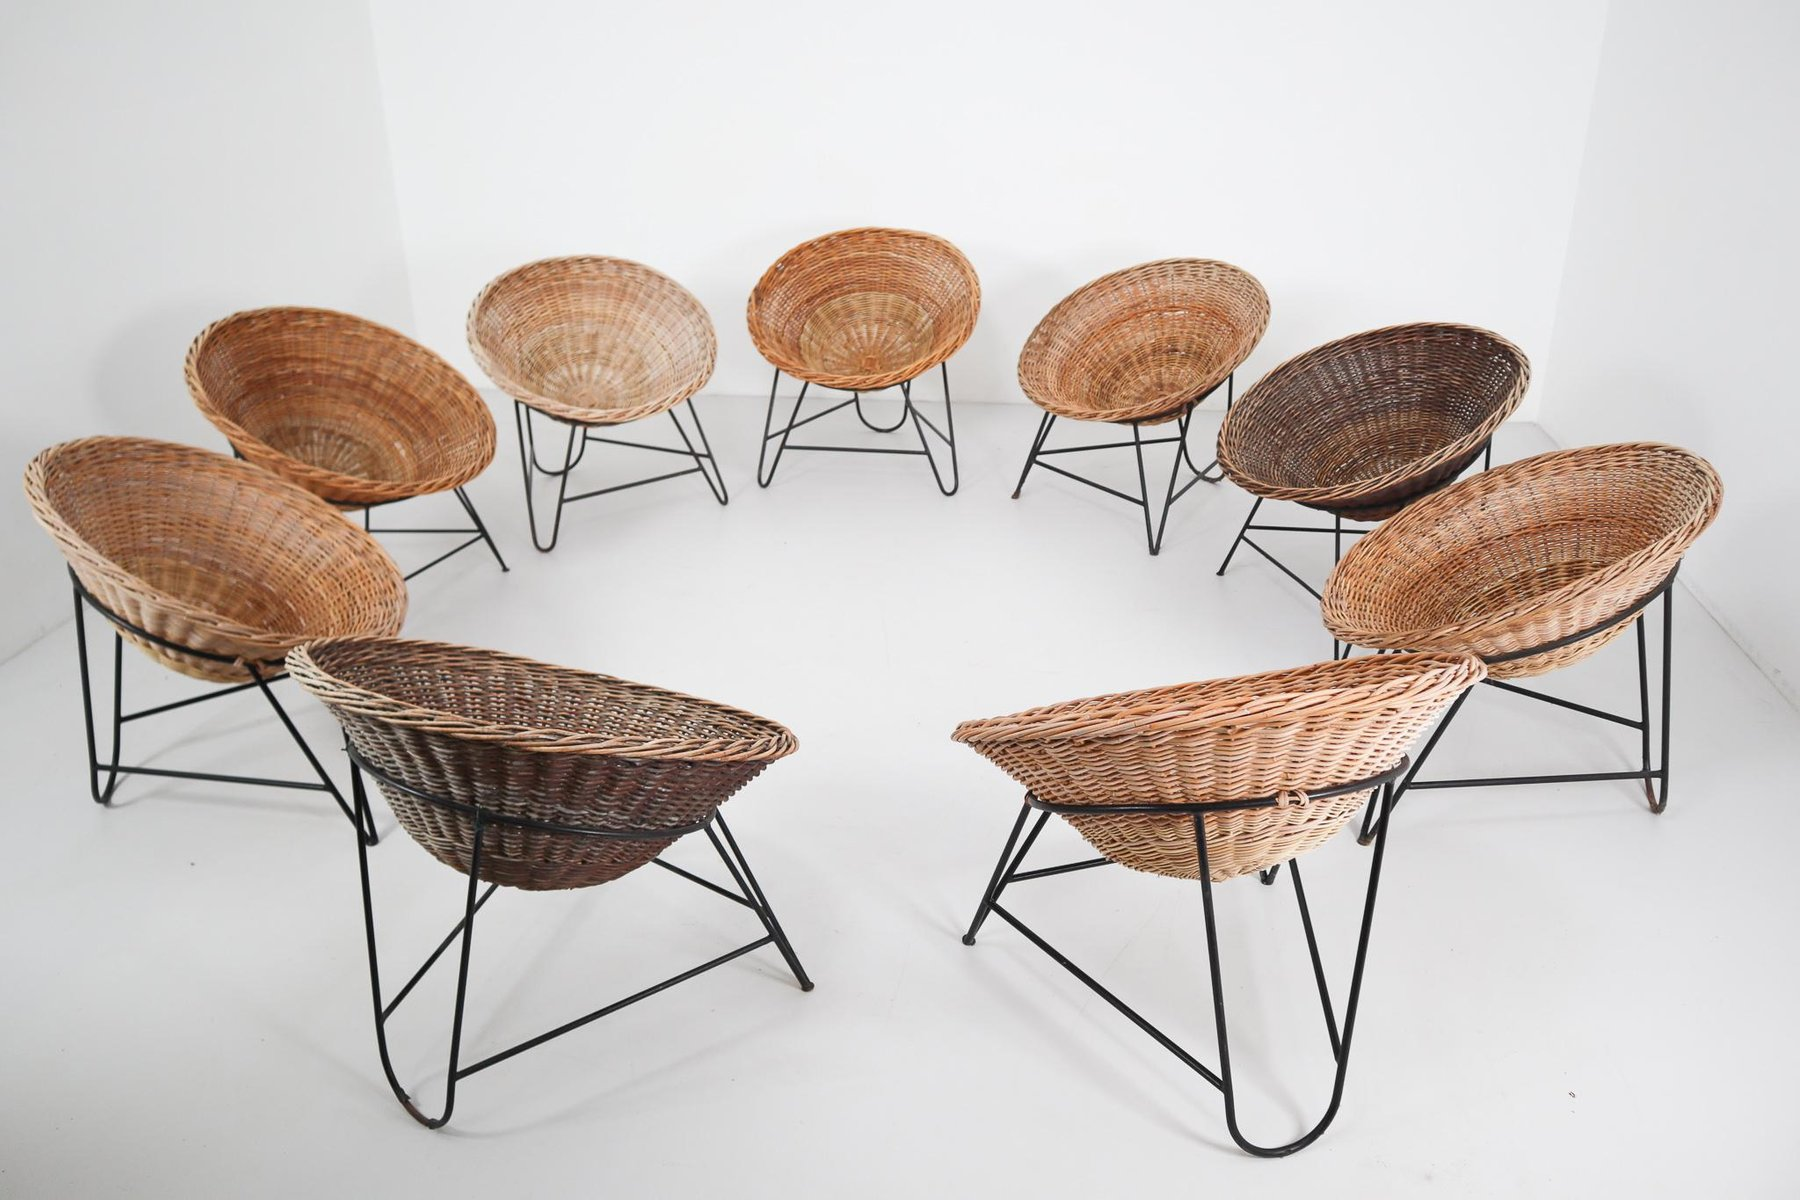 geflochtener mid century patio sessel 1960er